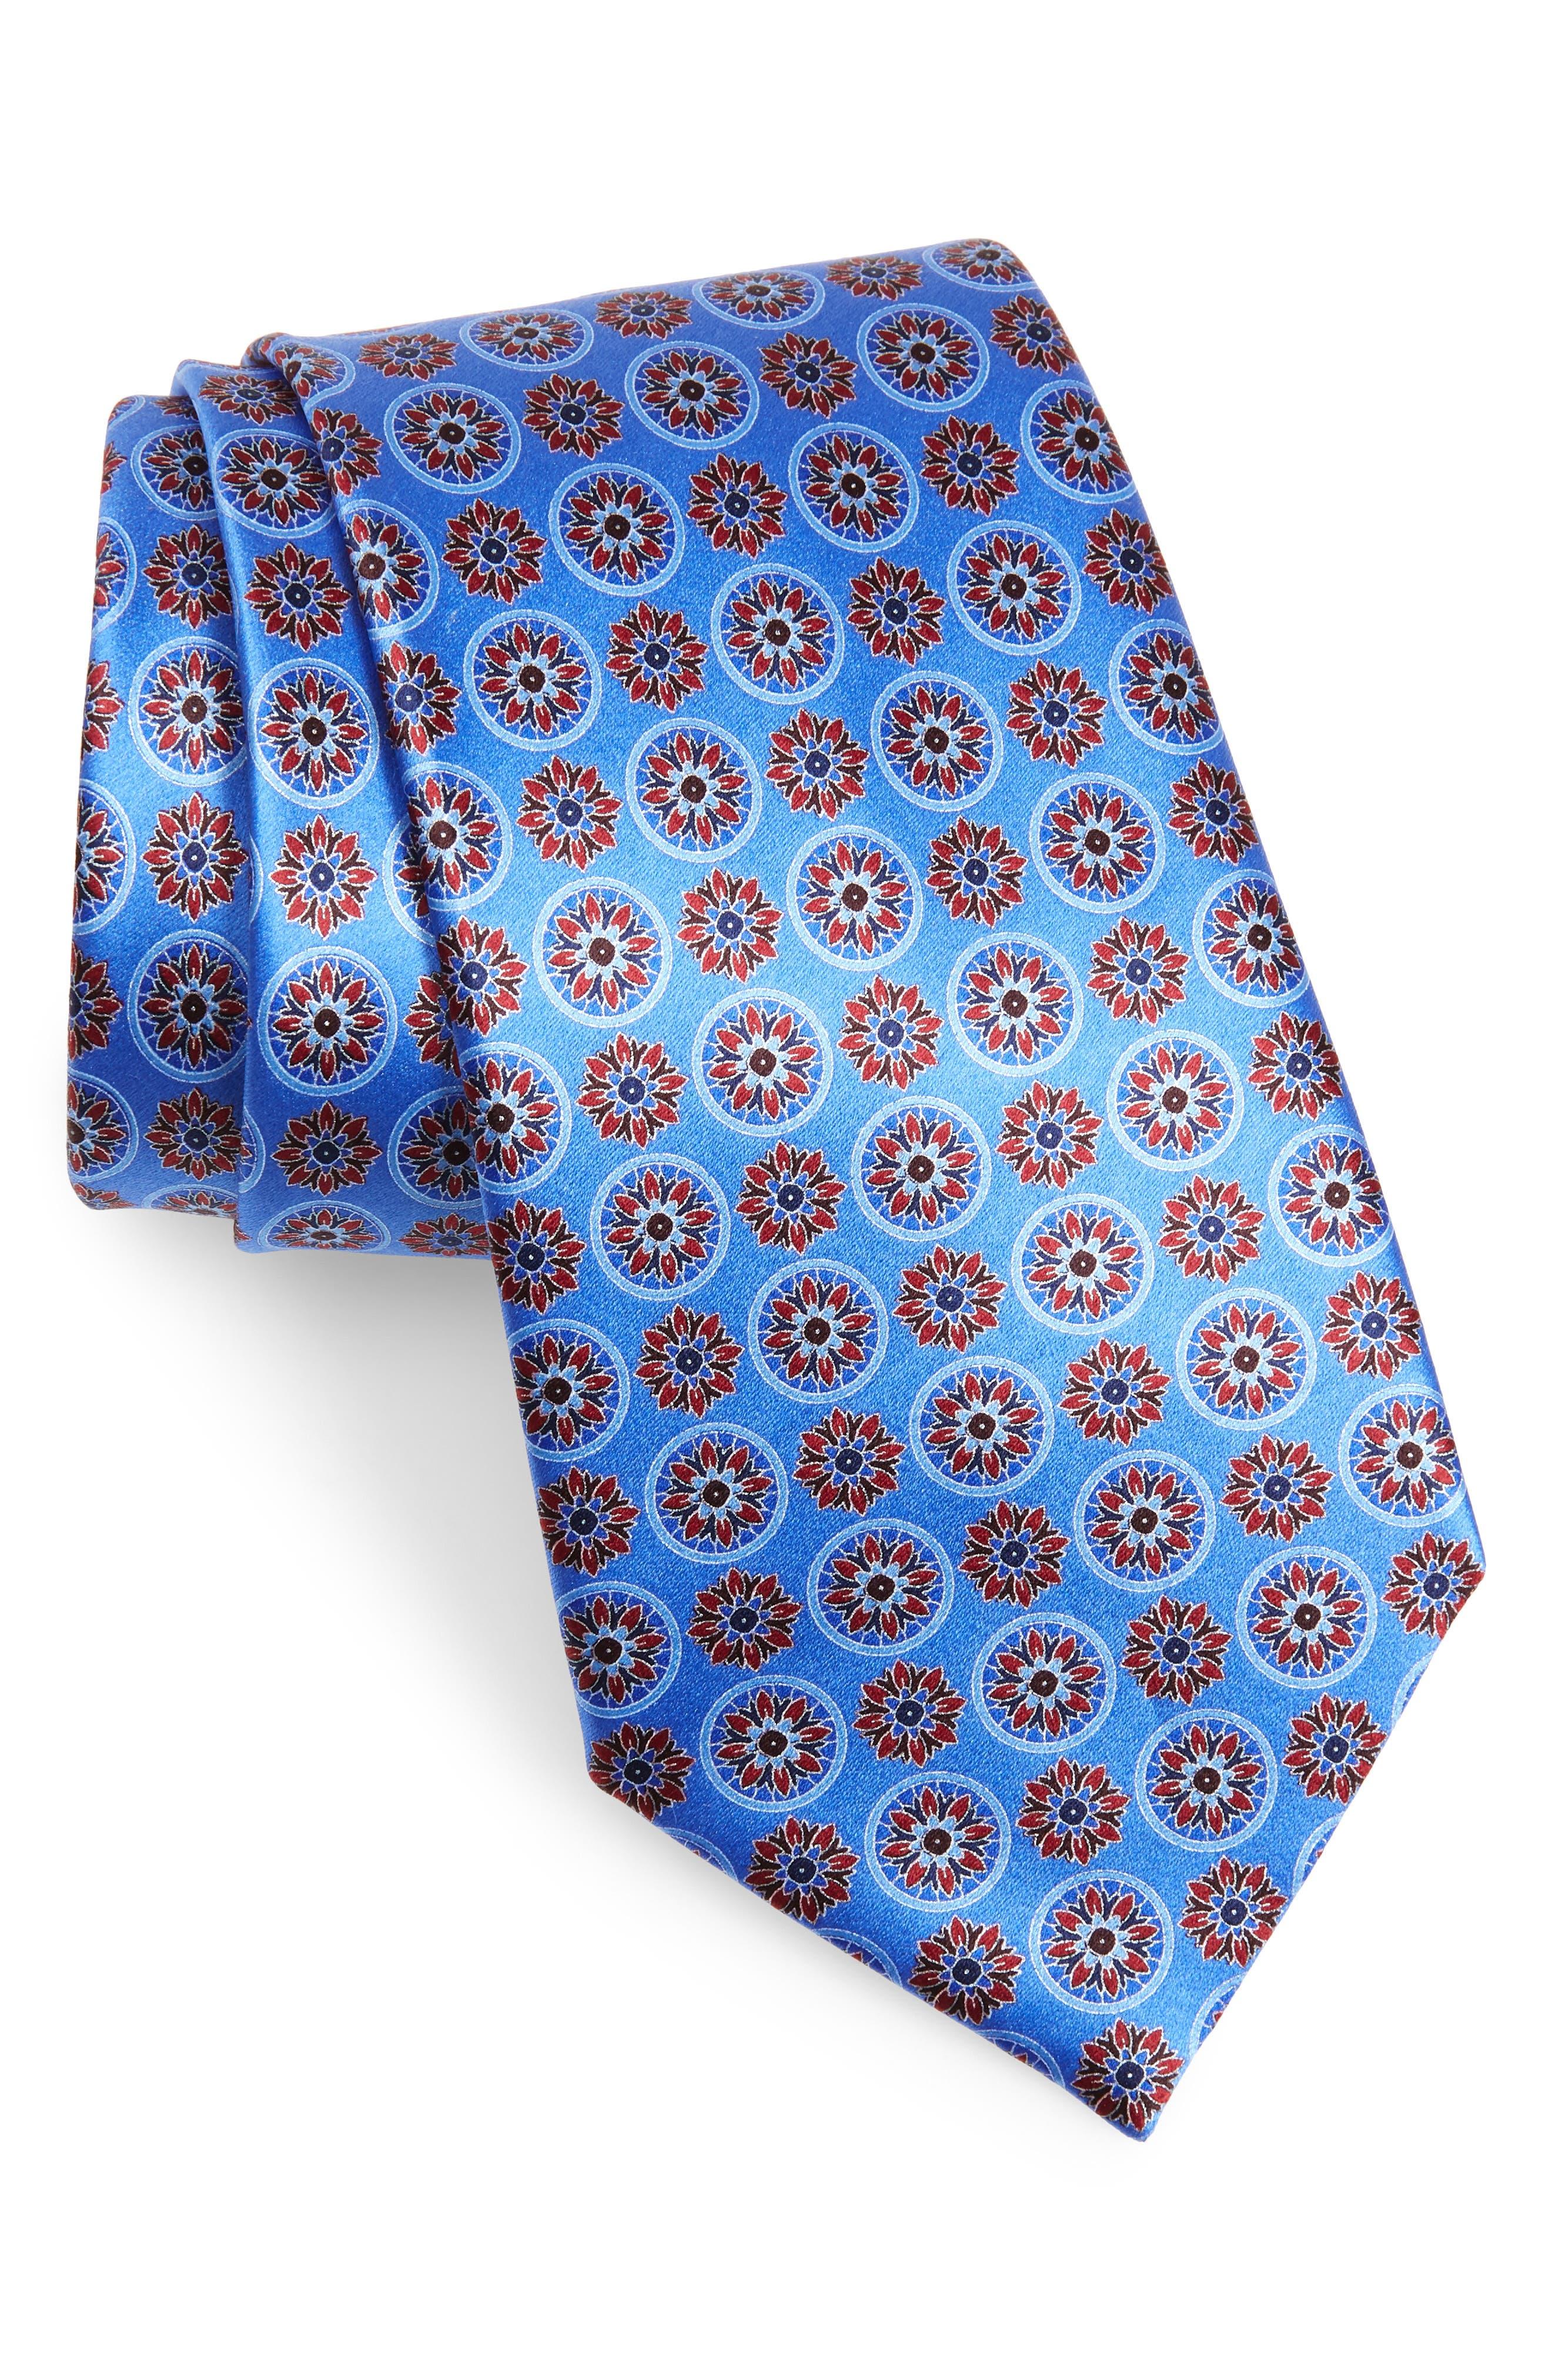 ERMENEGILDO ZEGNA, Floral Medallion Silk Tie, Main thumbnail 1, color, BLUE